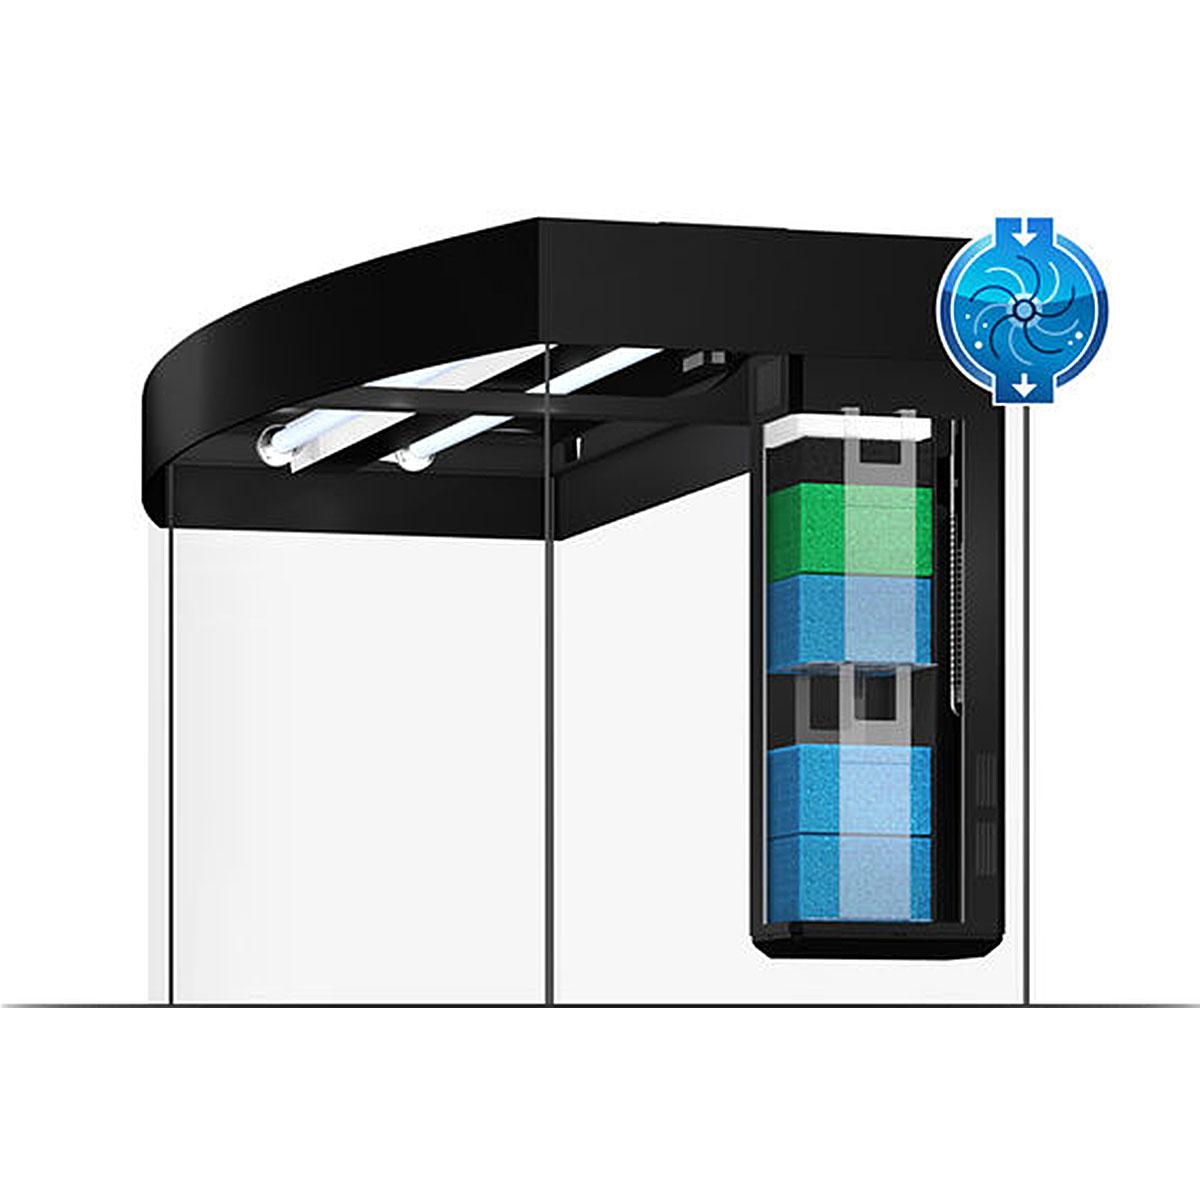 juwel aquarium vision 180 led mit unterschrank sbx bei zooroyal. Black Bedroom Furniture Sets. Home Design Ideas